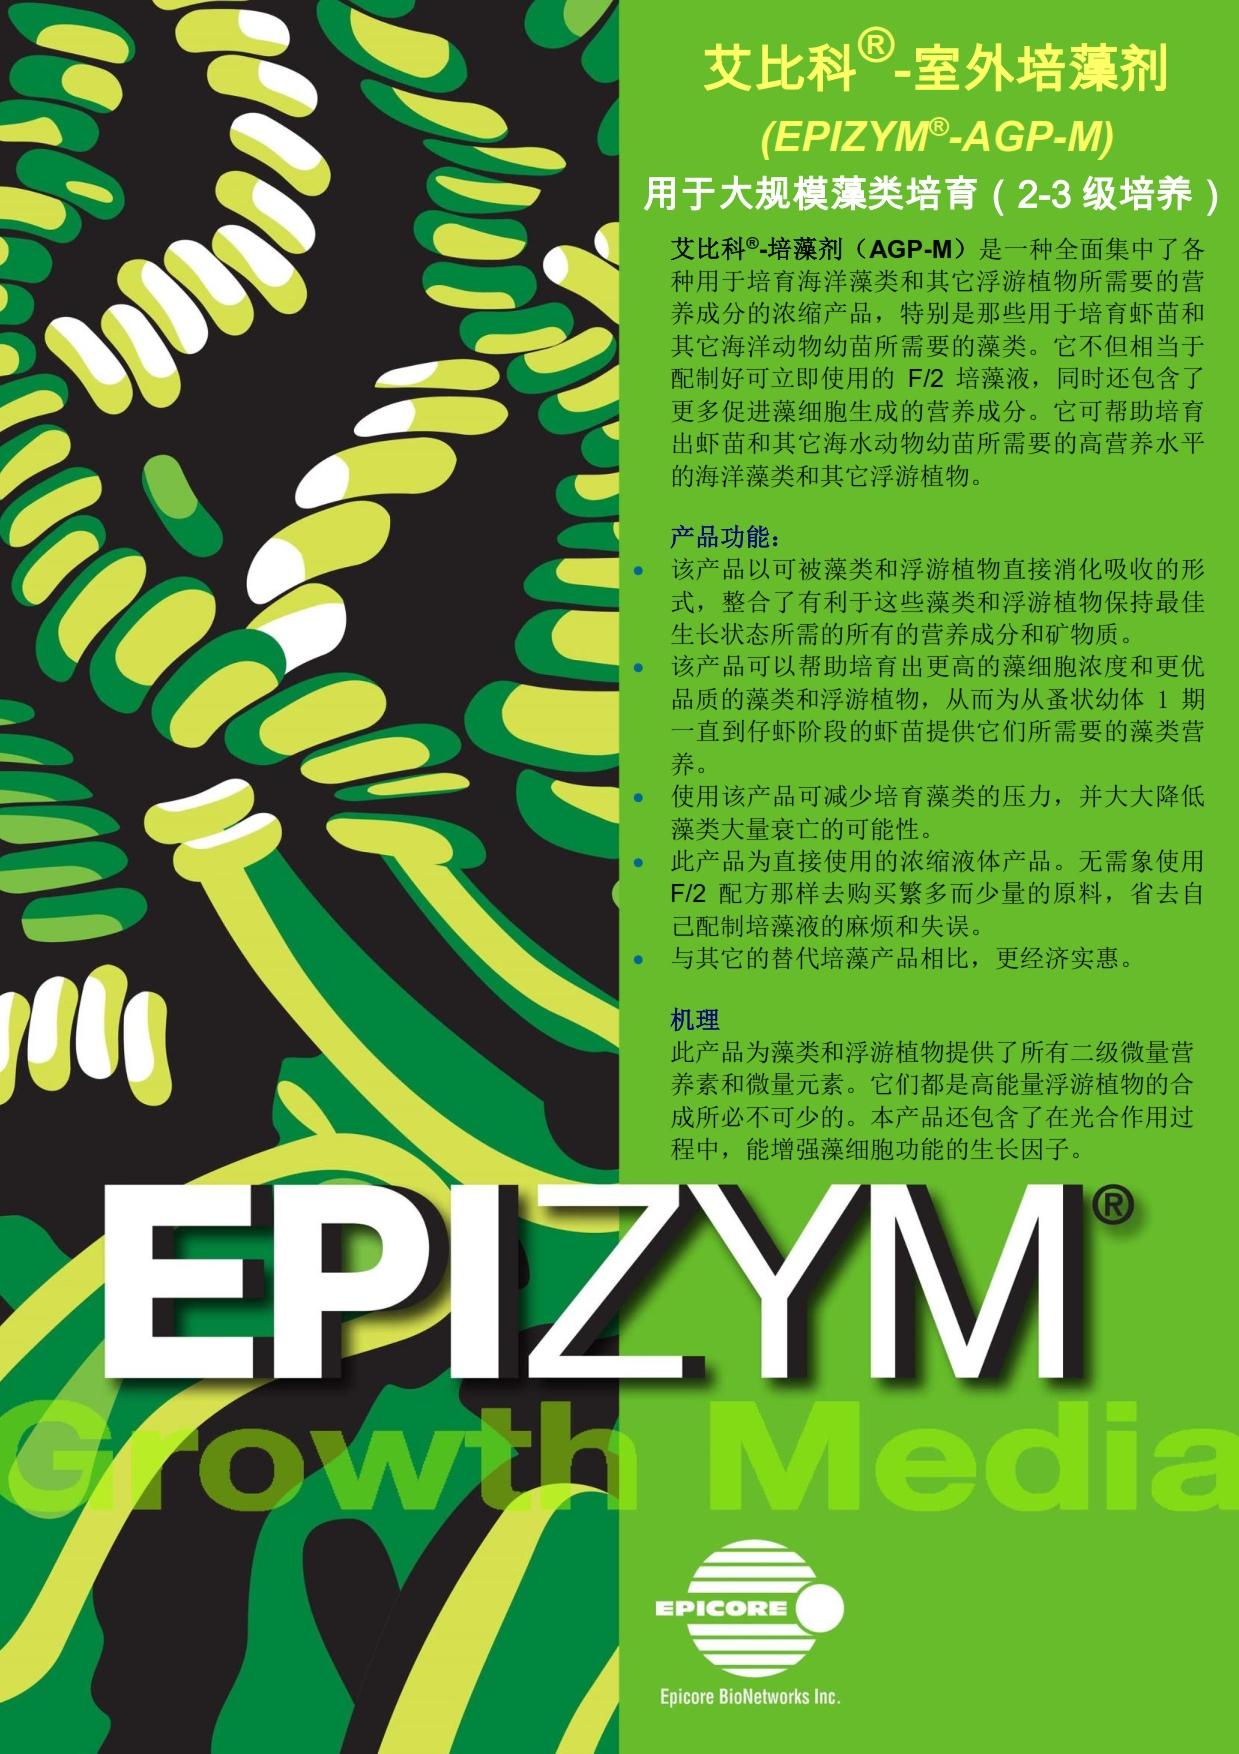 EPIZYM-AGP-M-2014-cn1-V3-web_001